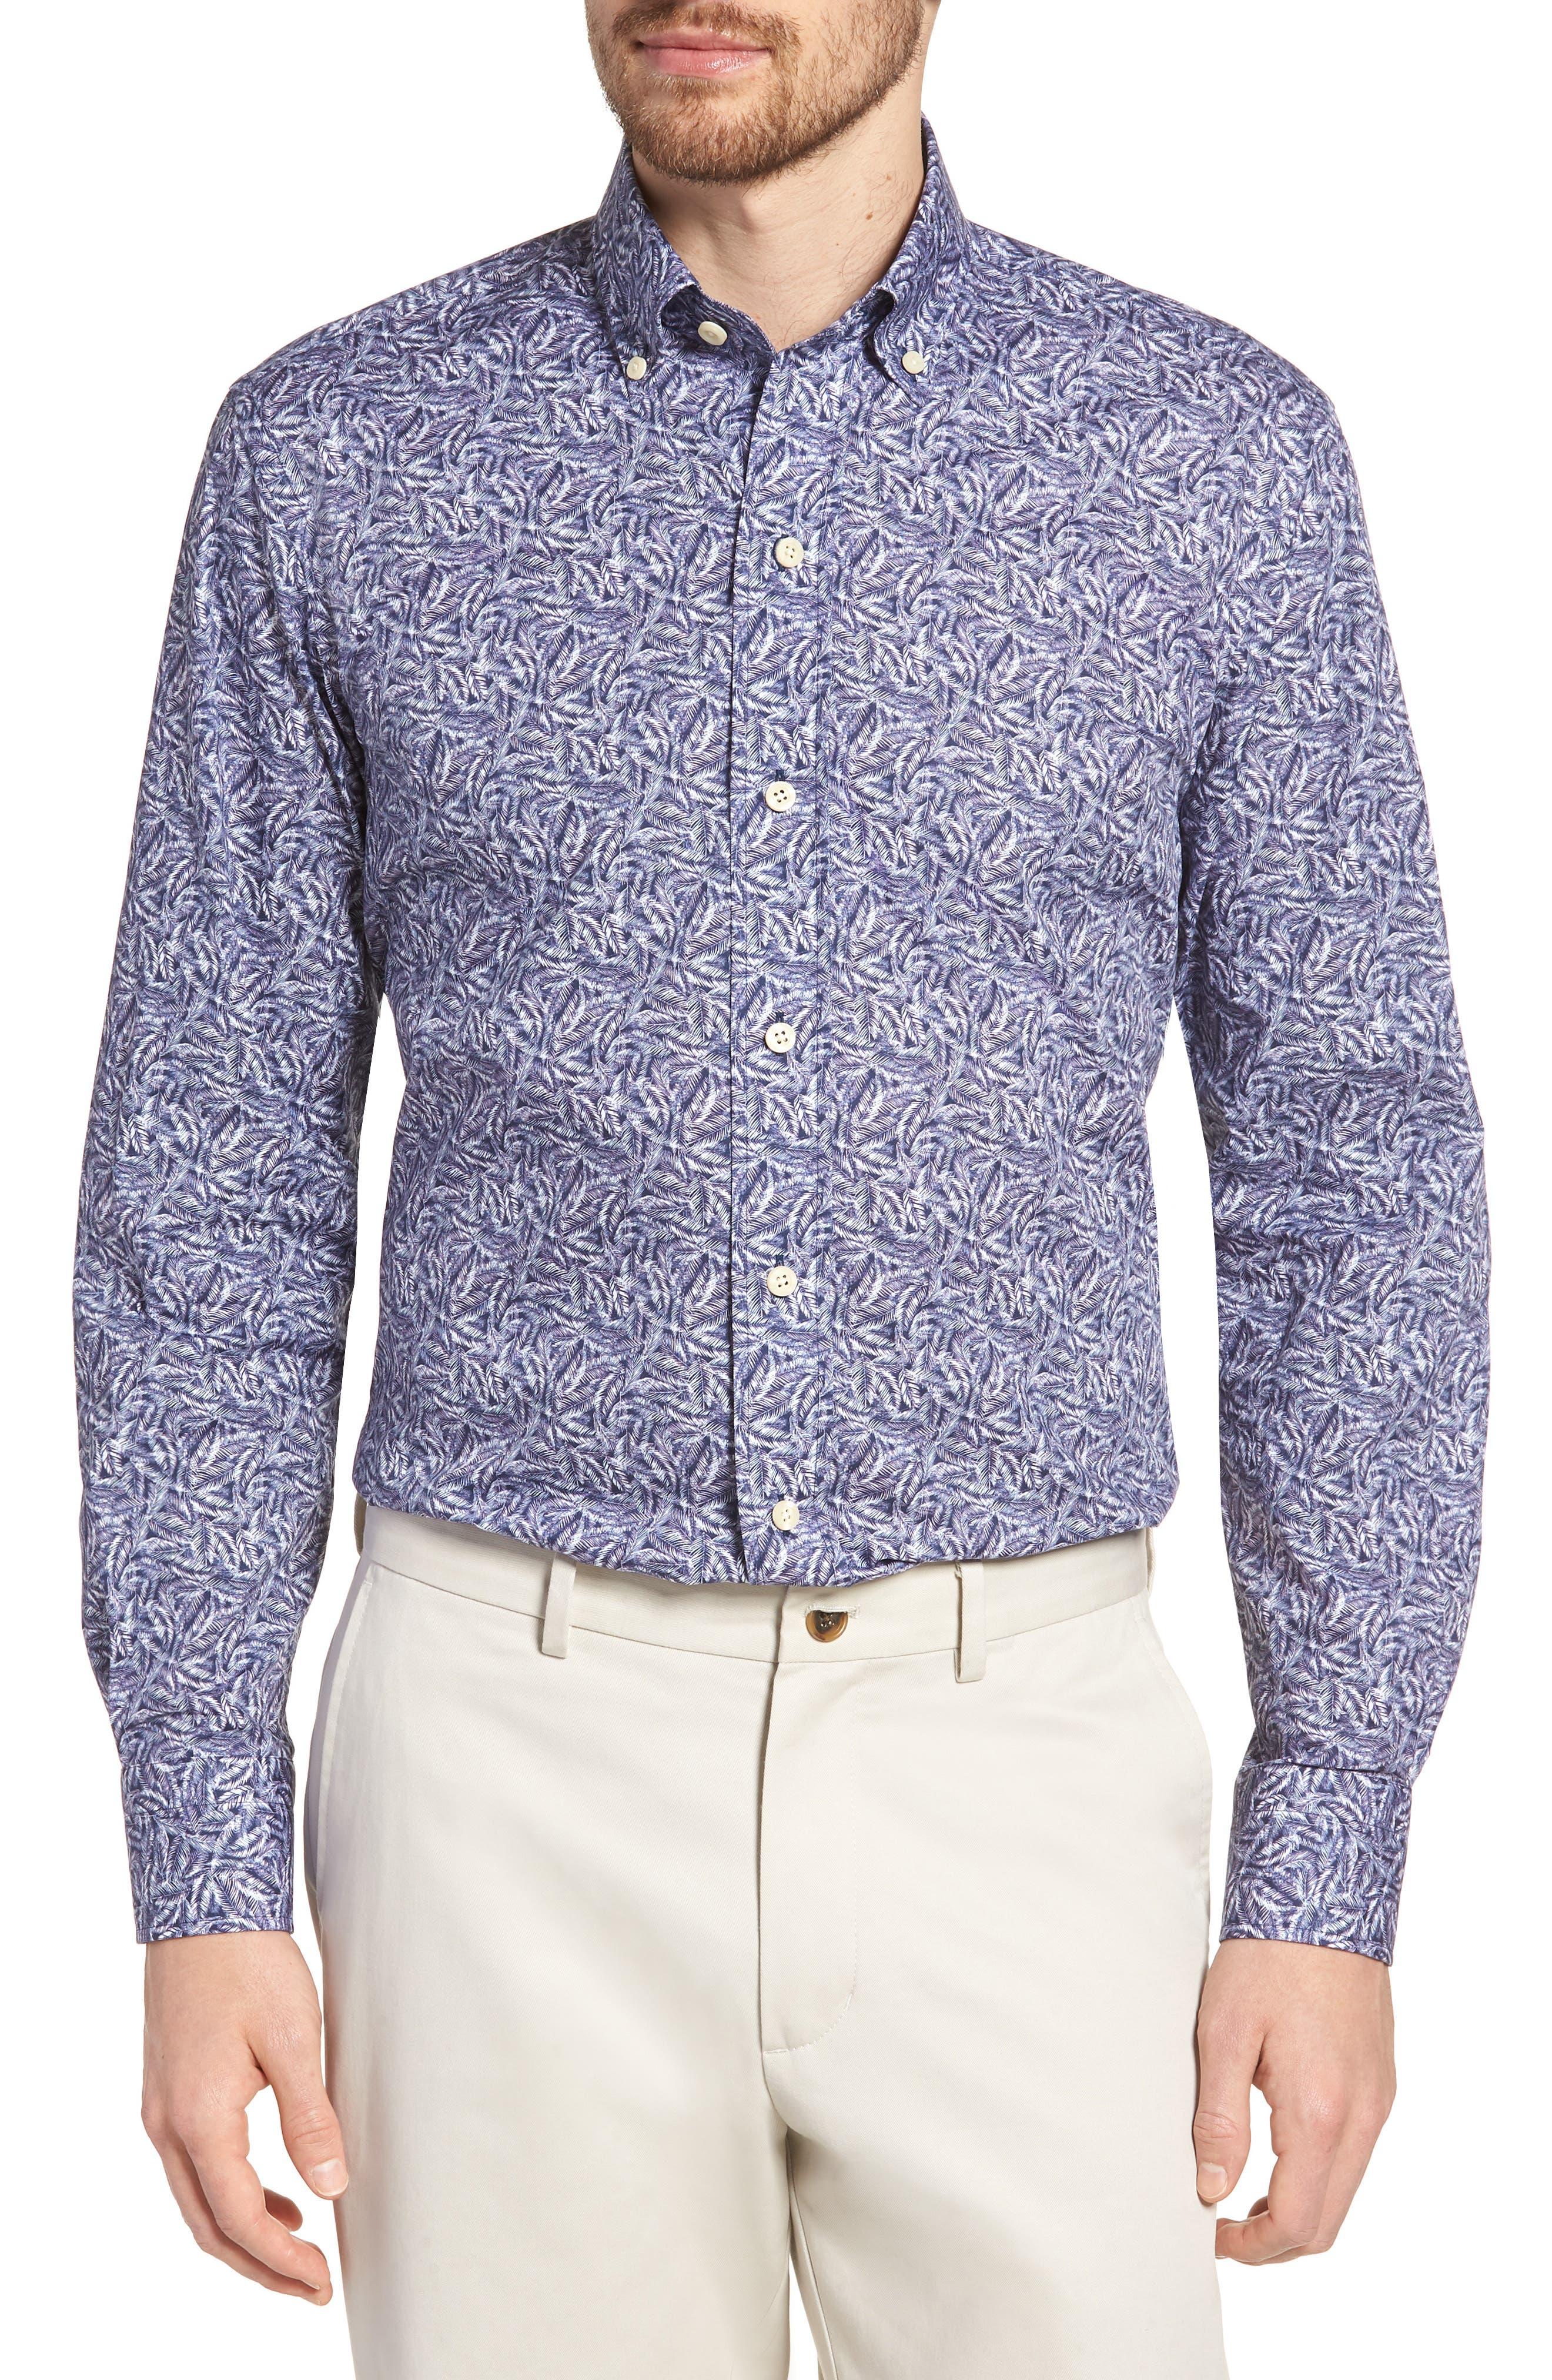 Garnaby Slim Fit Print Dress Shirt,                         Main,                         color, 400